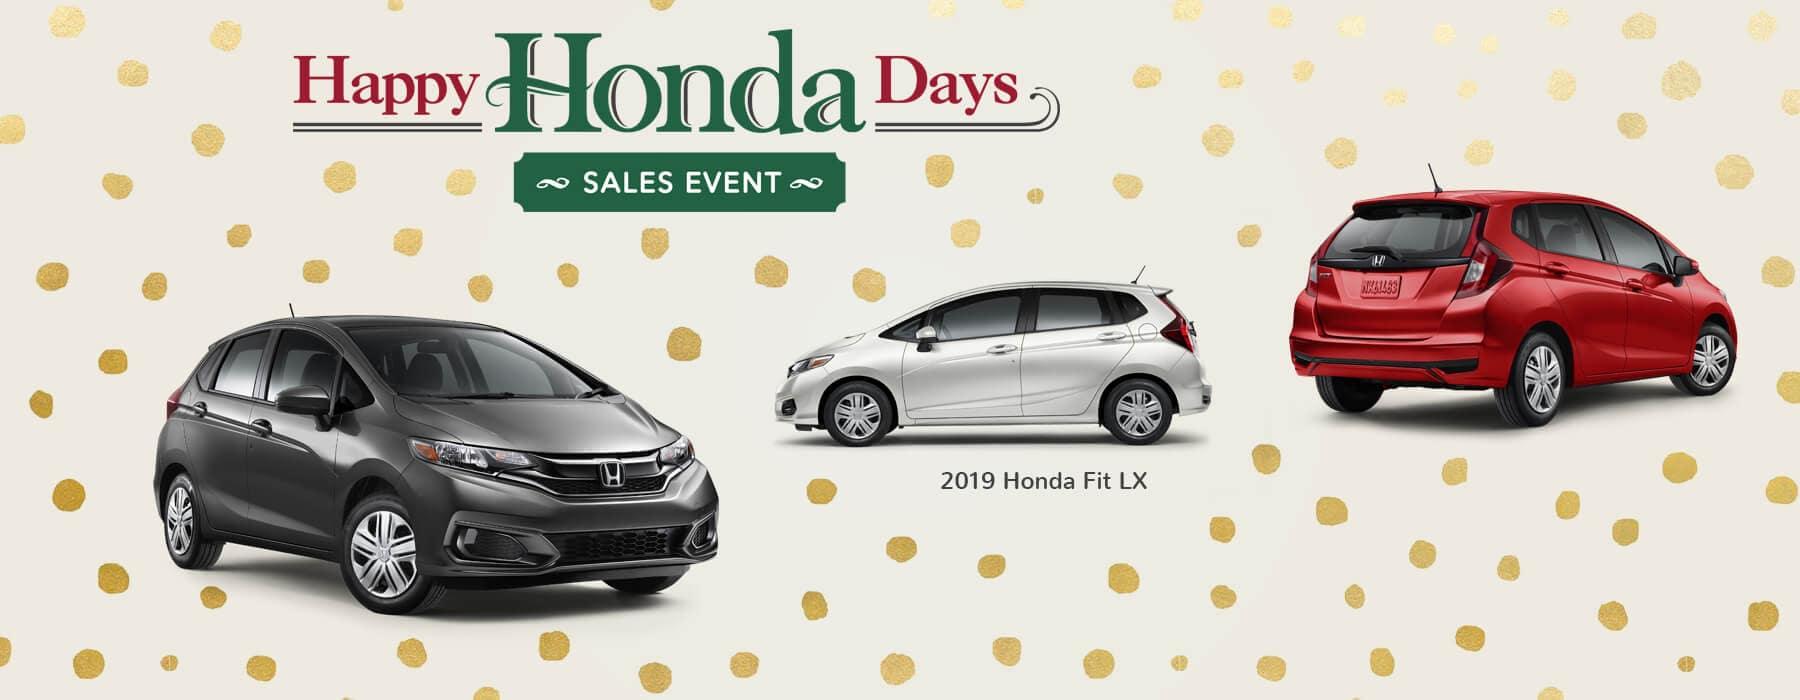 Happy Honda Days Sales Event 2019 Honda Fit Slider